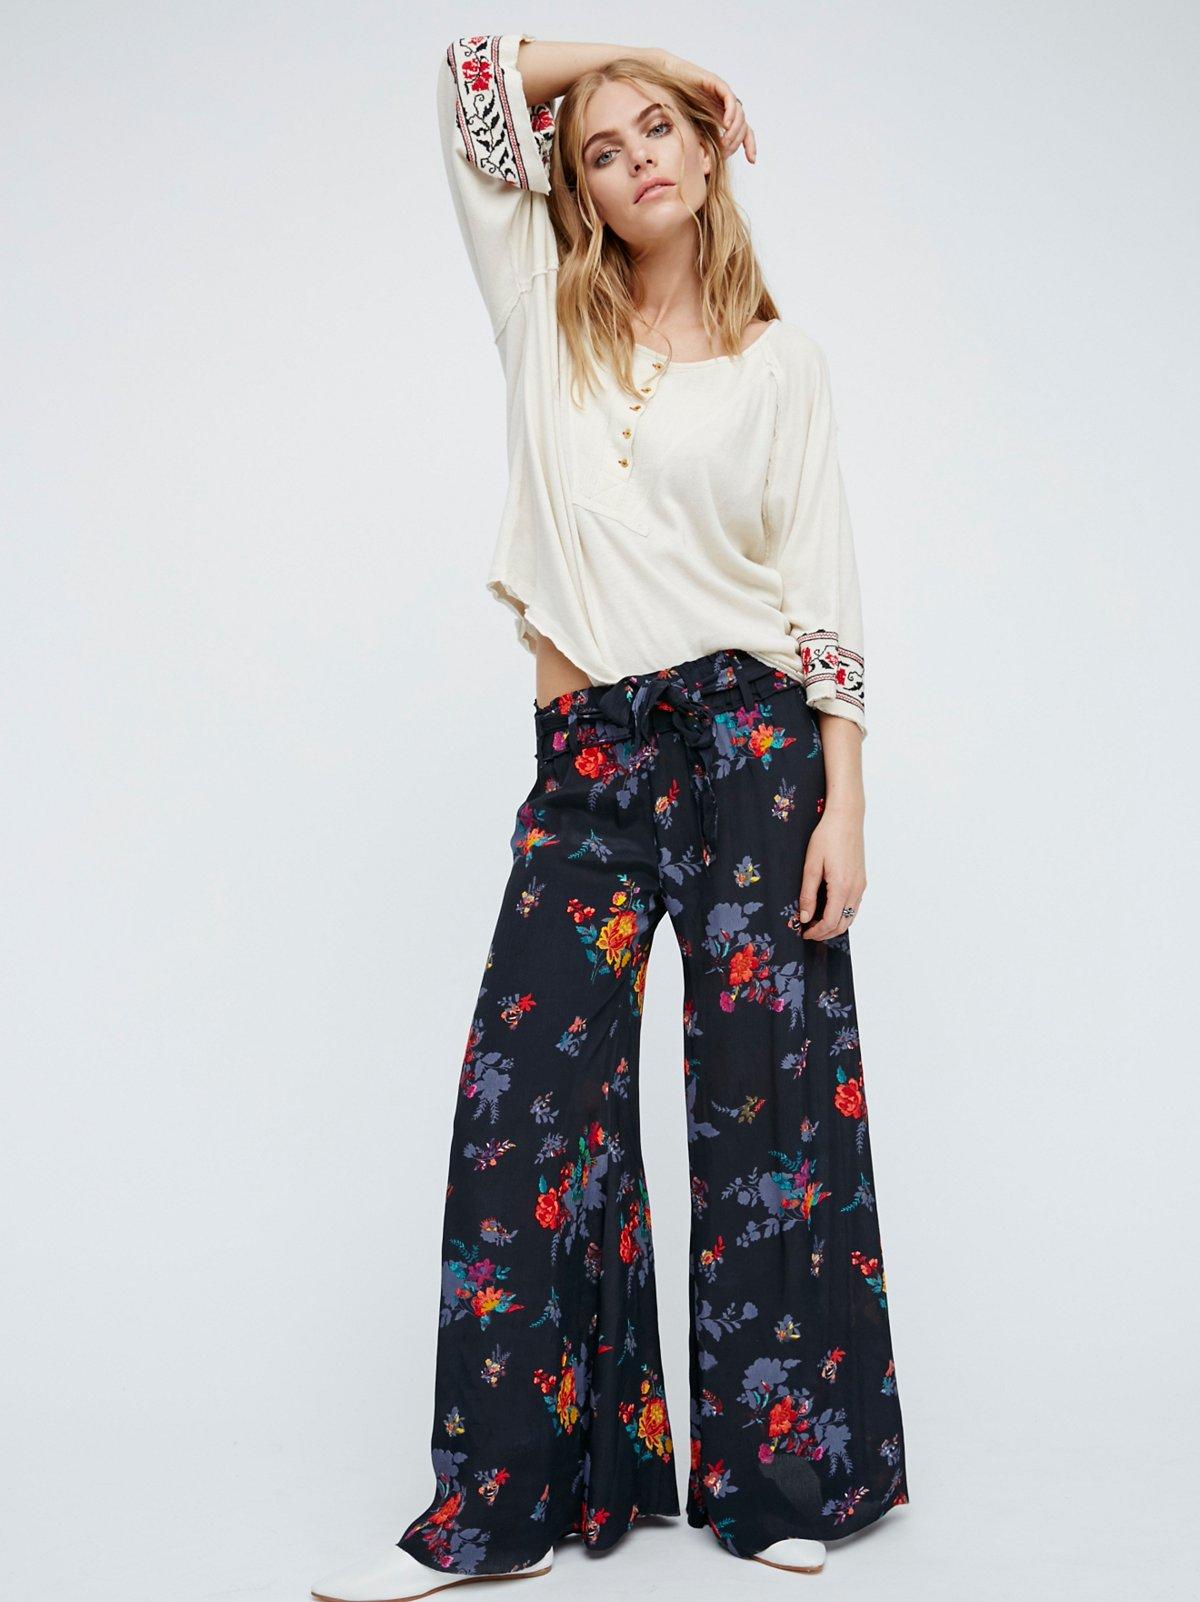 FP One Moonlight Garden长裤